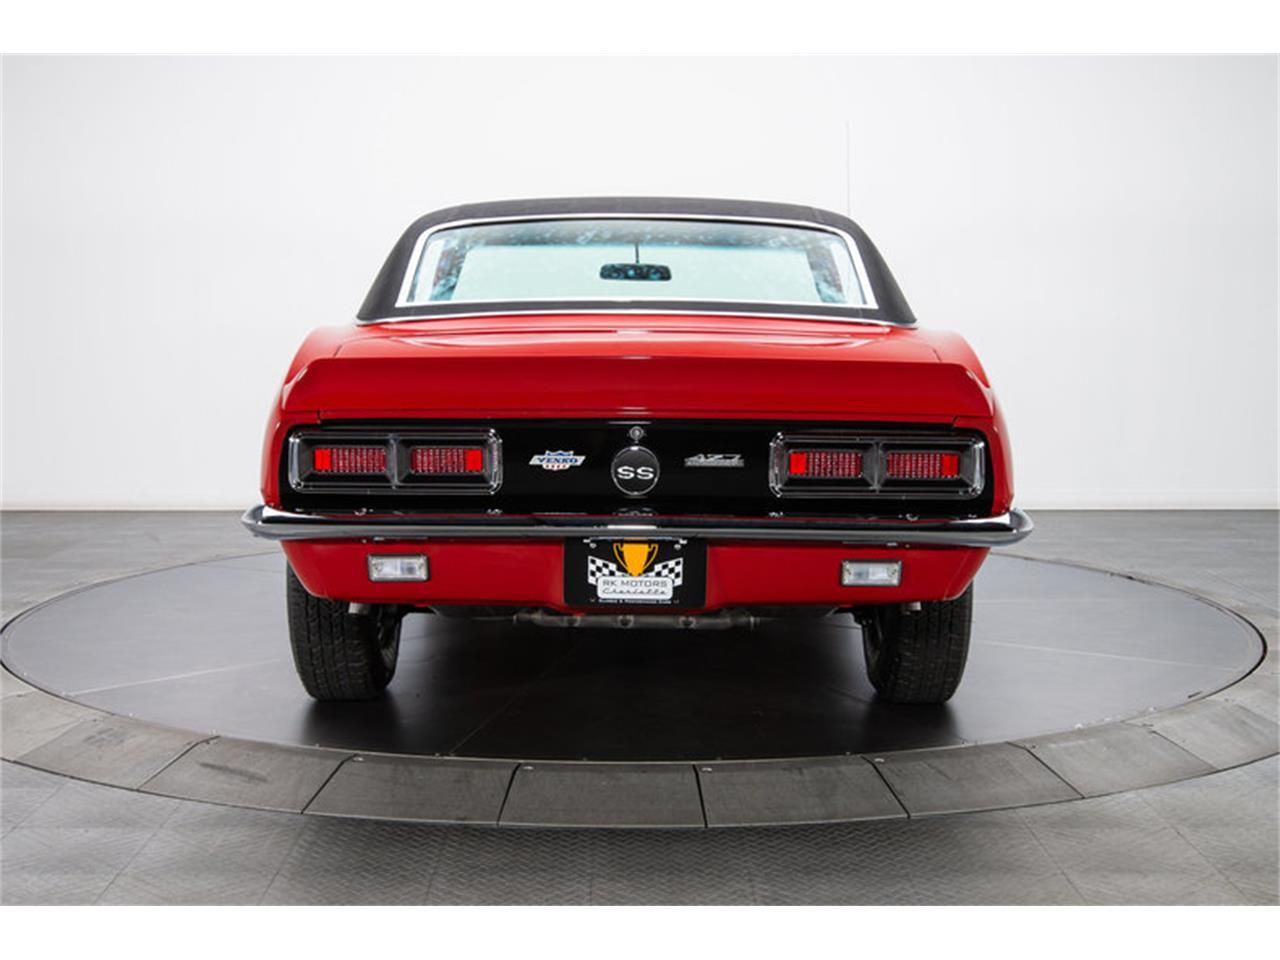 1968 Chevrolet Camaro Yenko For Sale Cc 1136530 Large Picture Of 68 Ocya